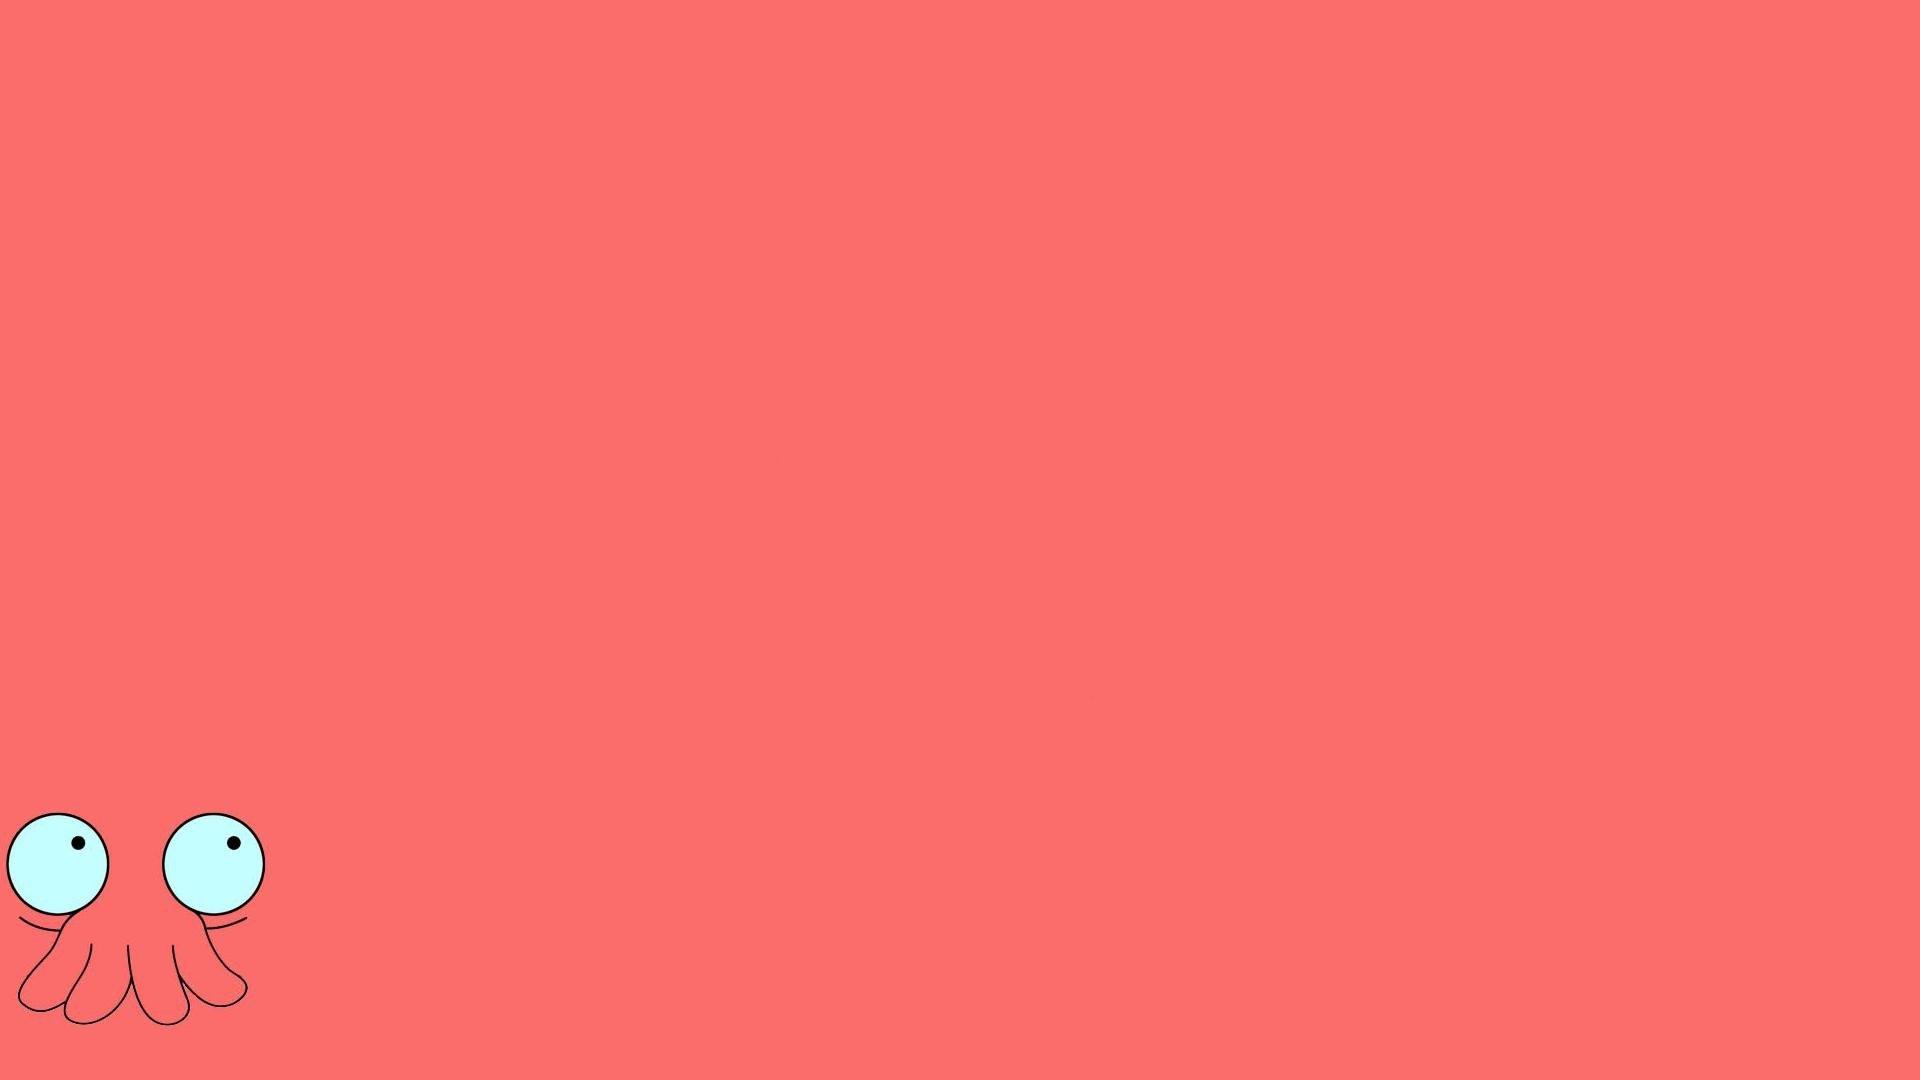 futurama dr zoidberg simple wallpaper 1920x1080 290140